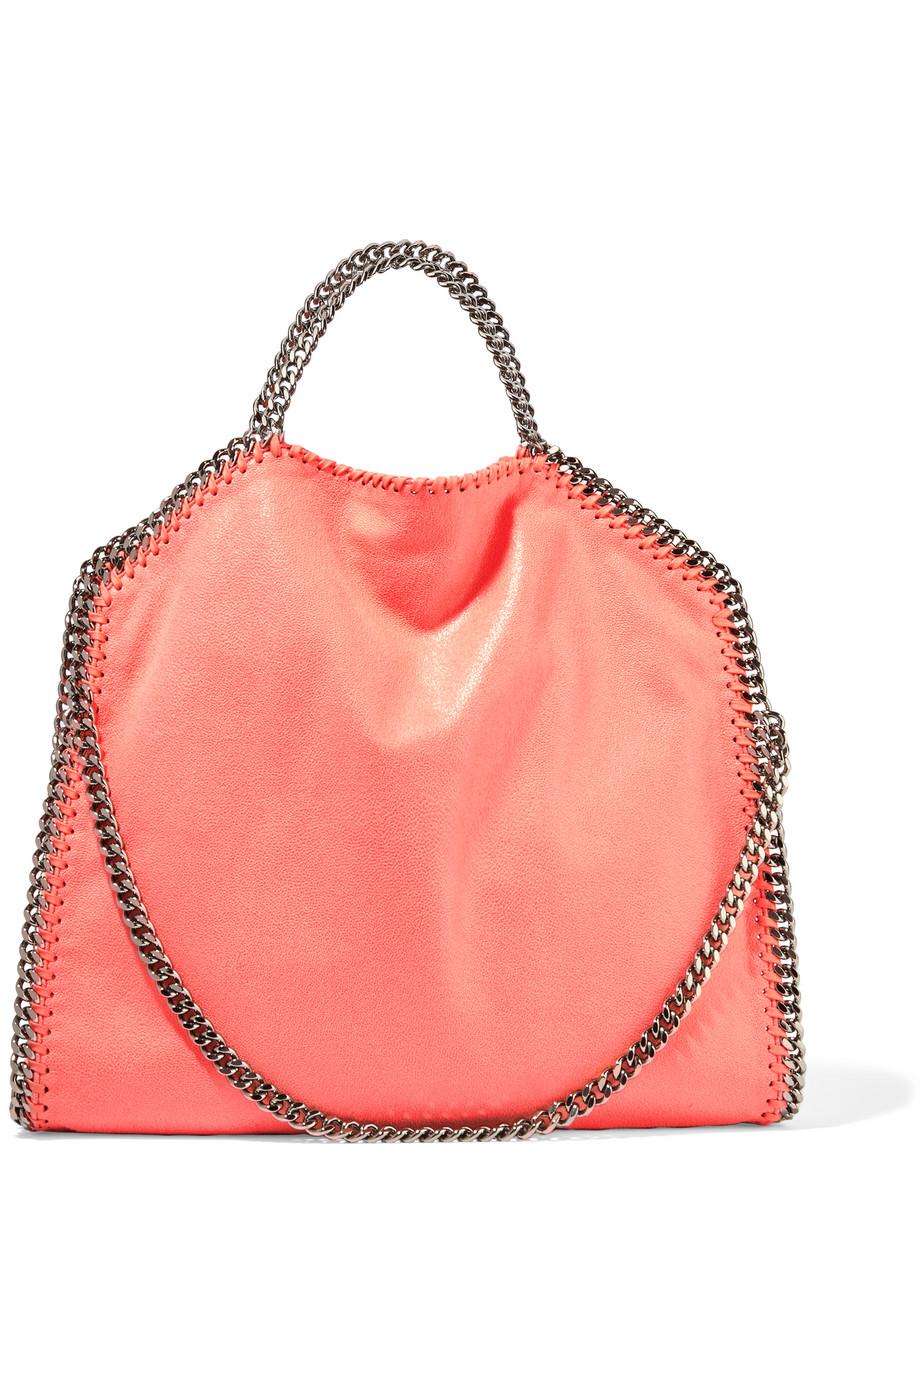 Stella Mccartney The Falabella Large Faux Brushed-Leather Shoulder Bag, Coral, Women's